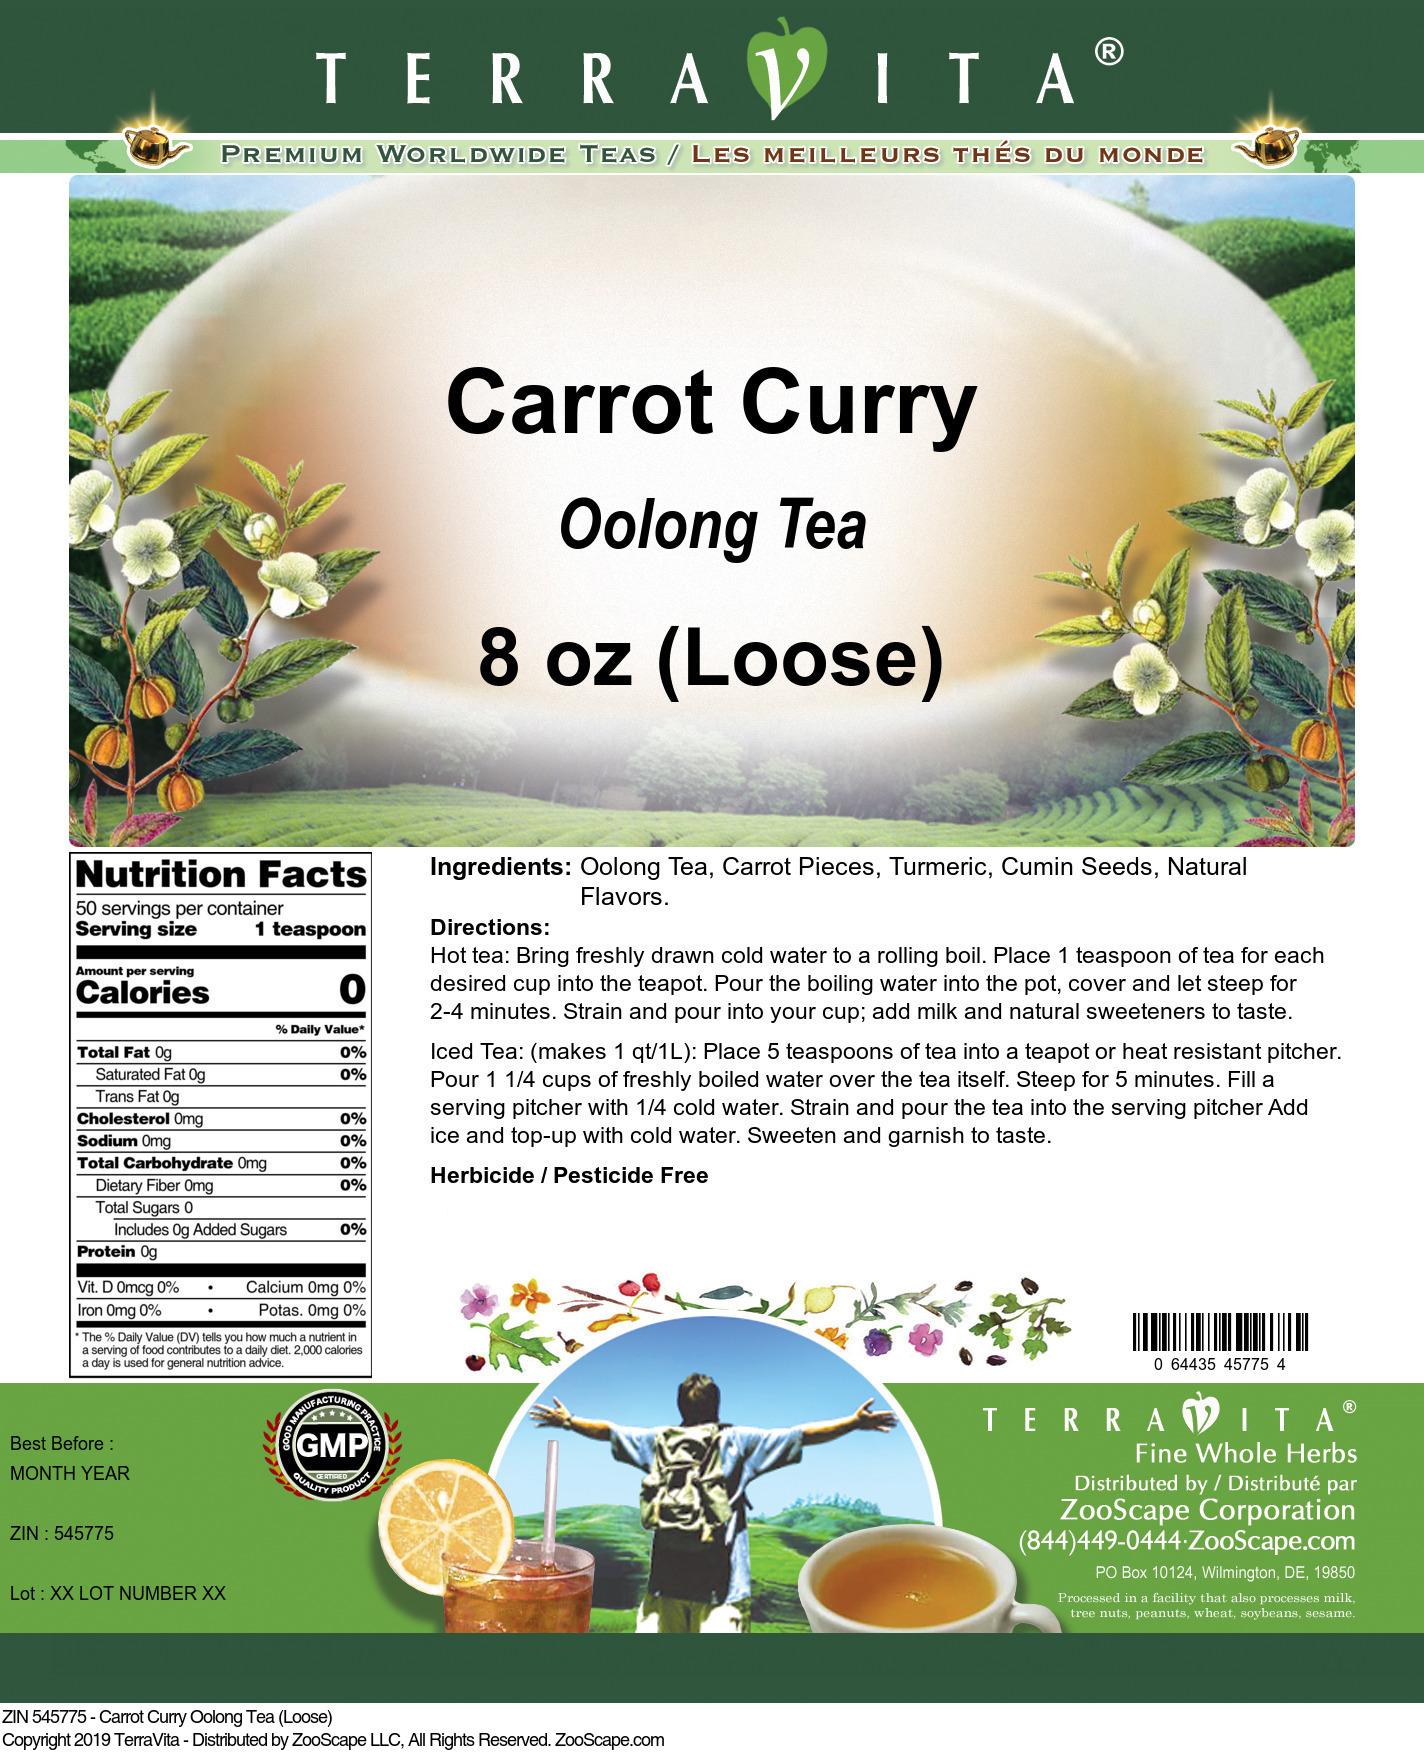 Carrot Curry Oolong Tea (Loose)